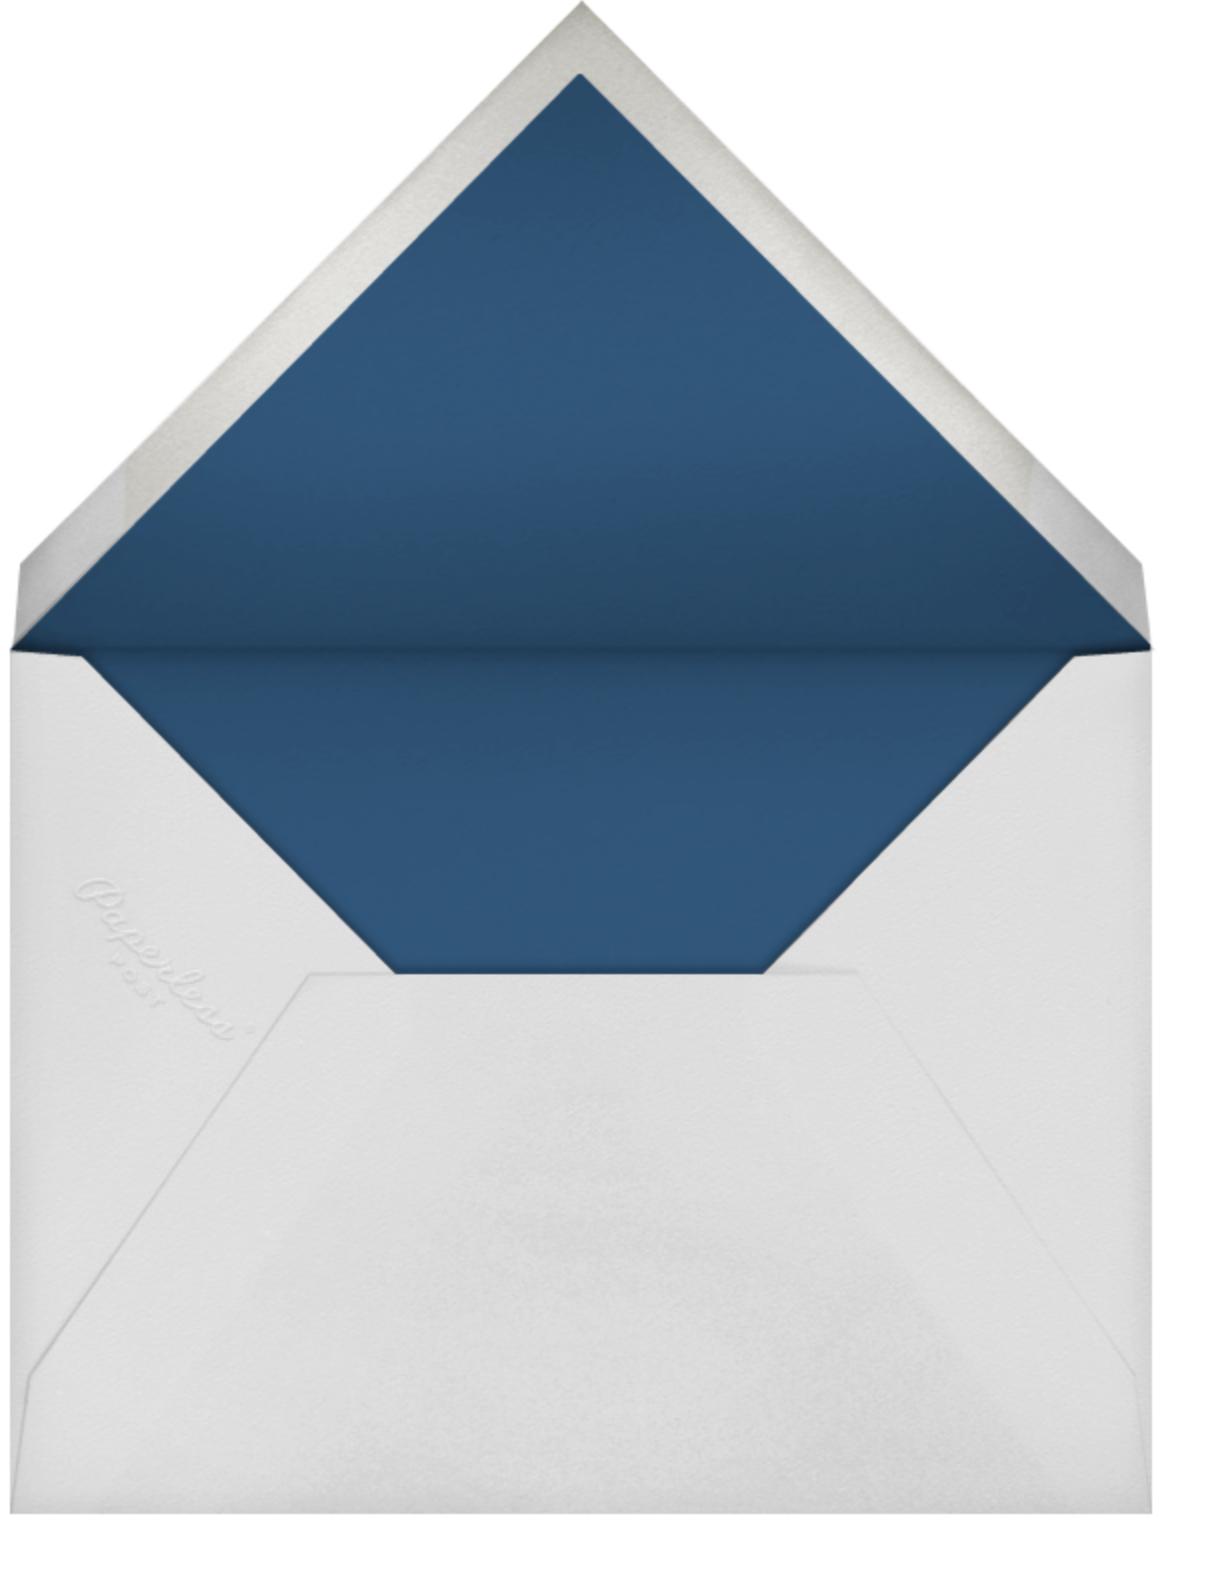 Blossoms on Tulle I - Bright Blue - Oscar de la Renta - Envelope